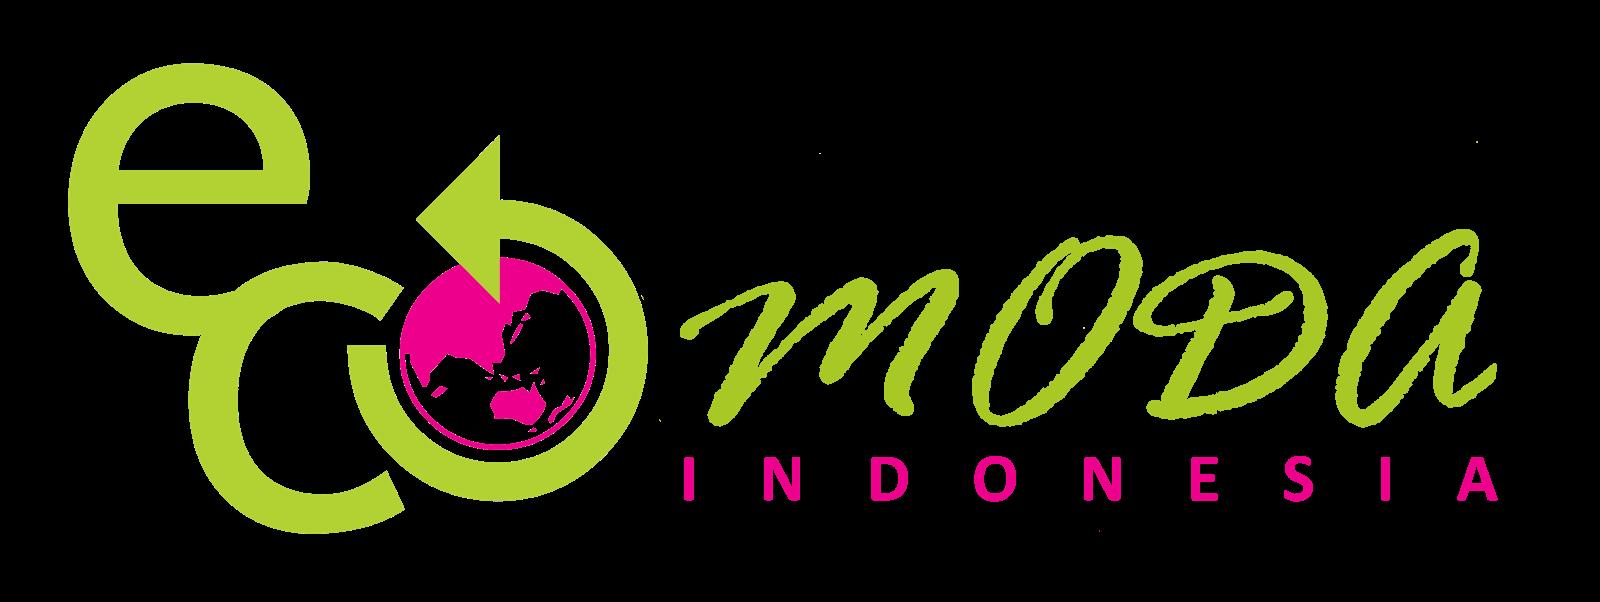 ECOmoda Indonesia